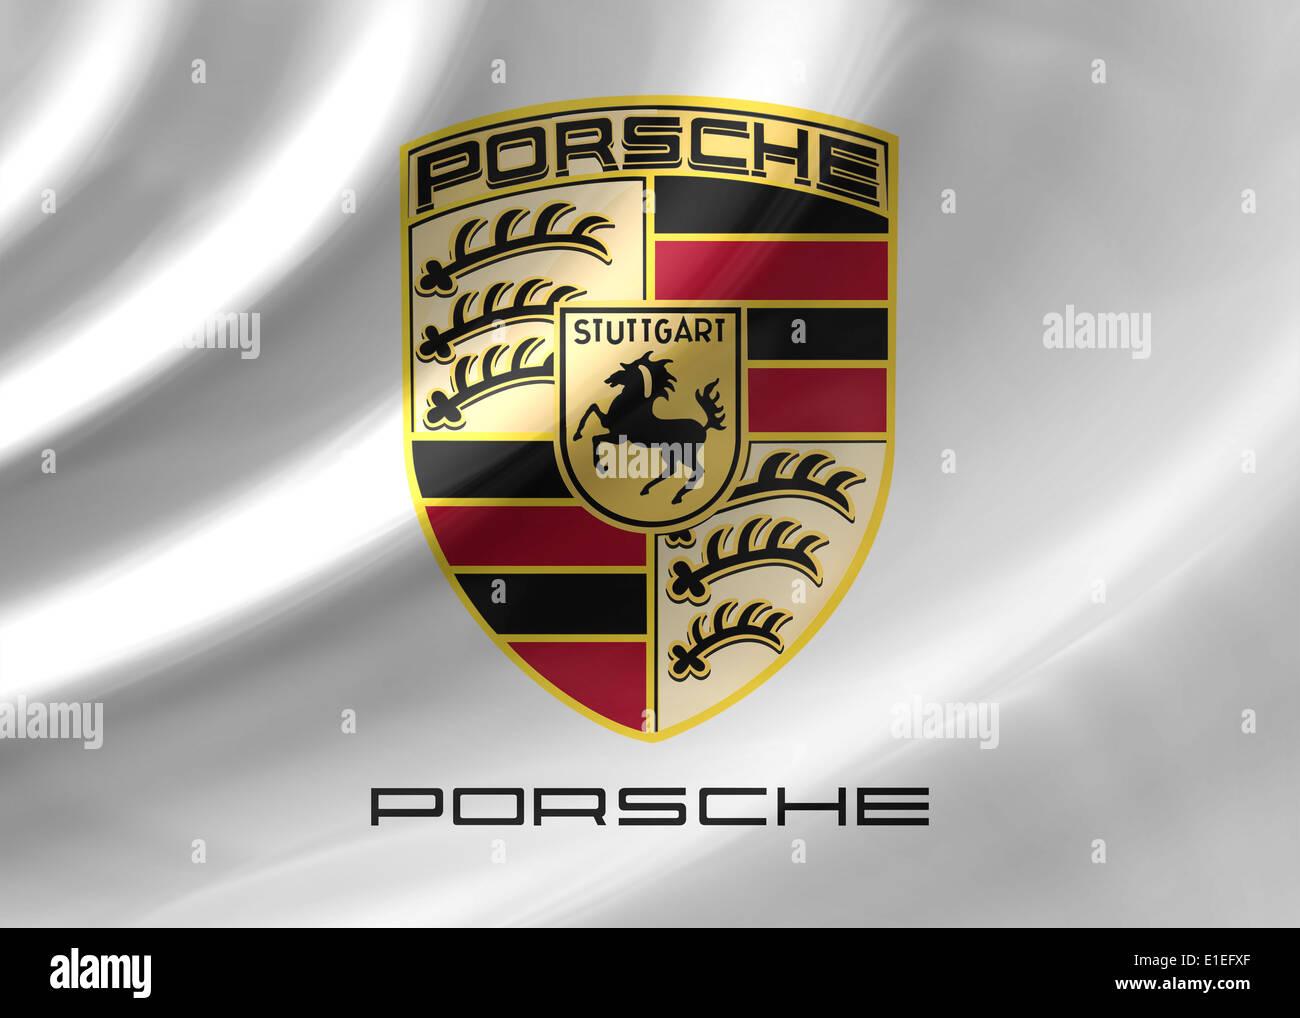 Porsche Logo Symbol Icon Flag Emblem Stock Photo Royalty